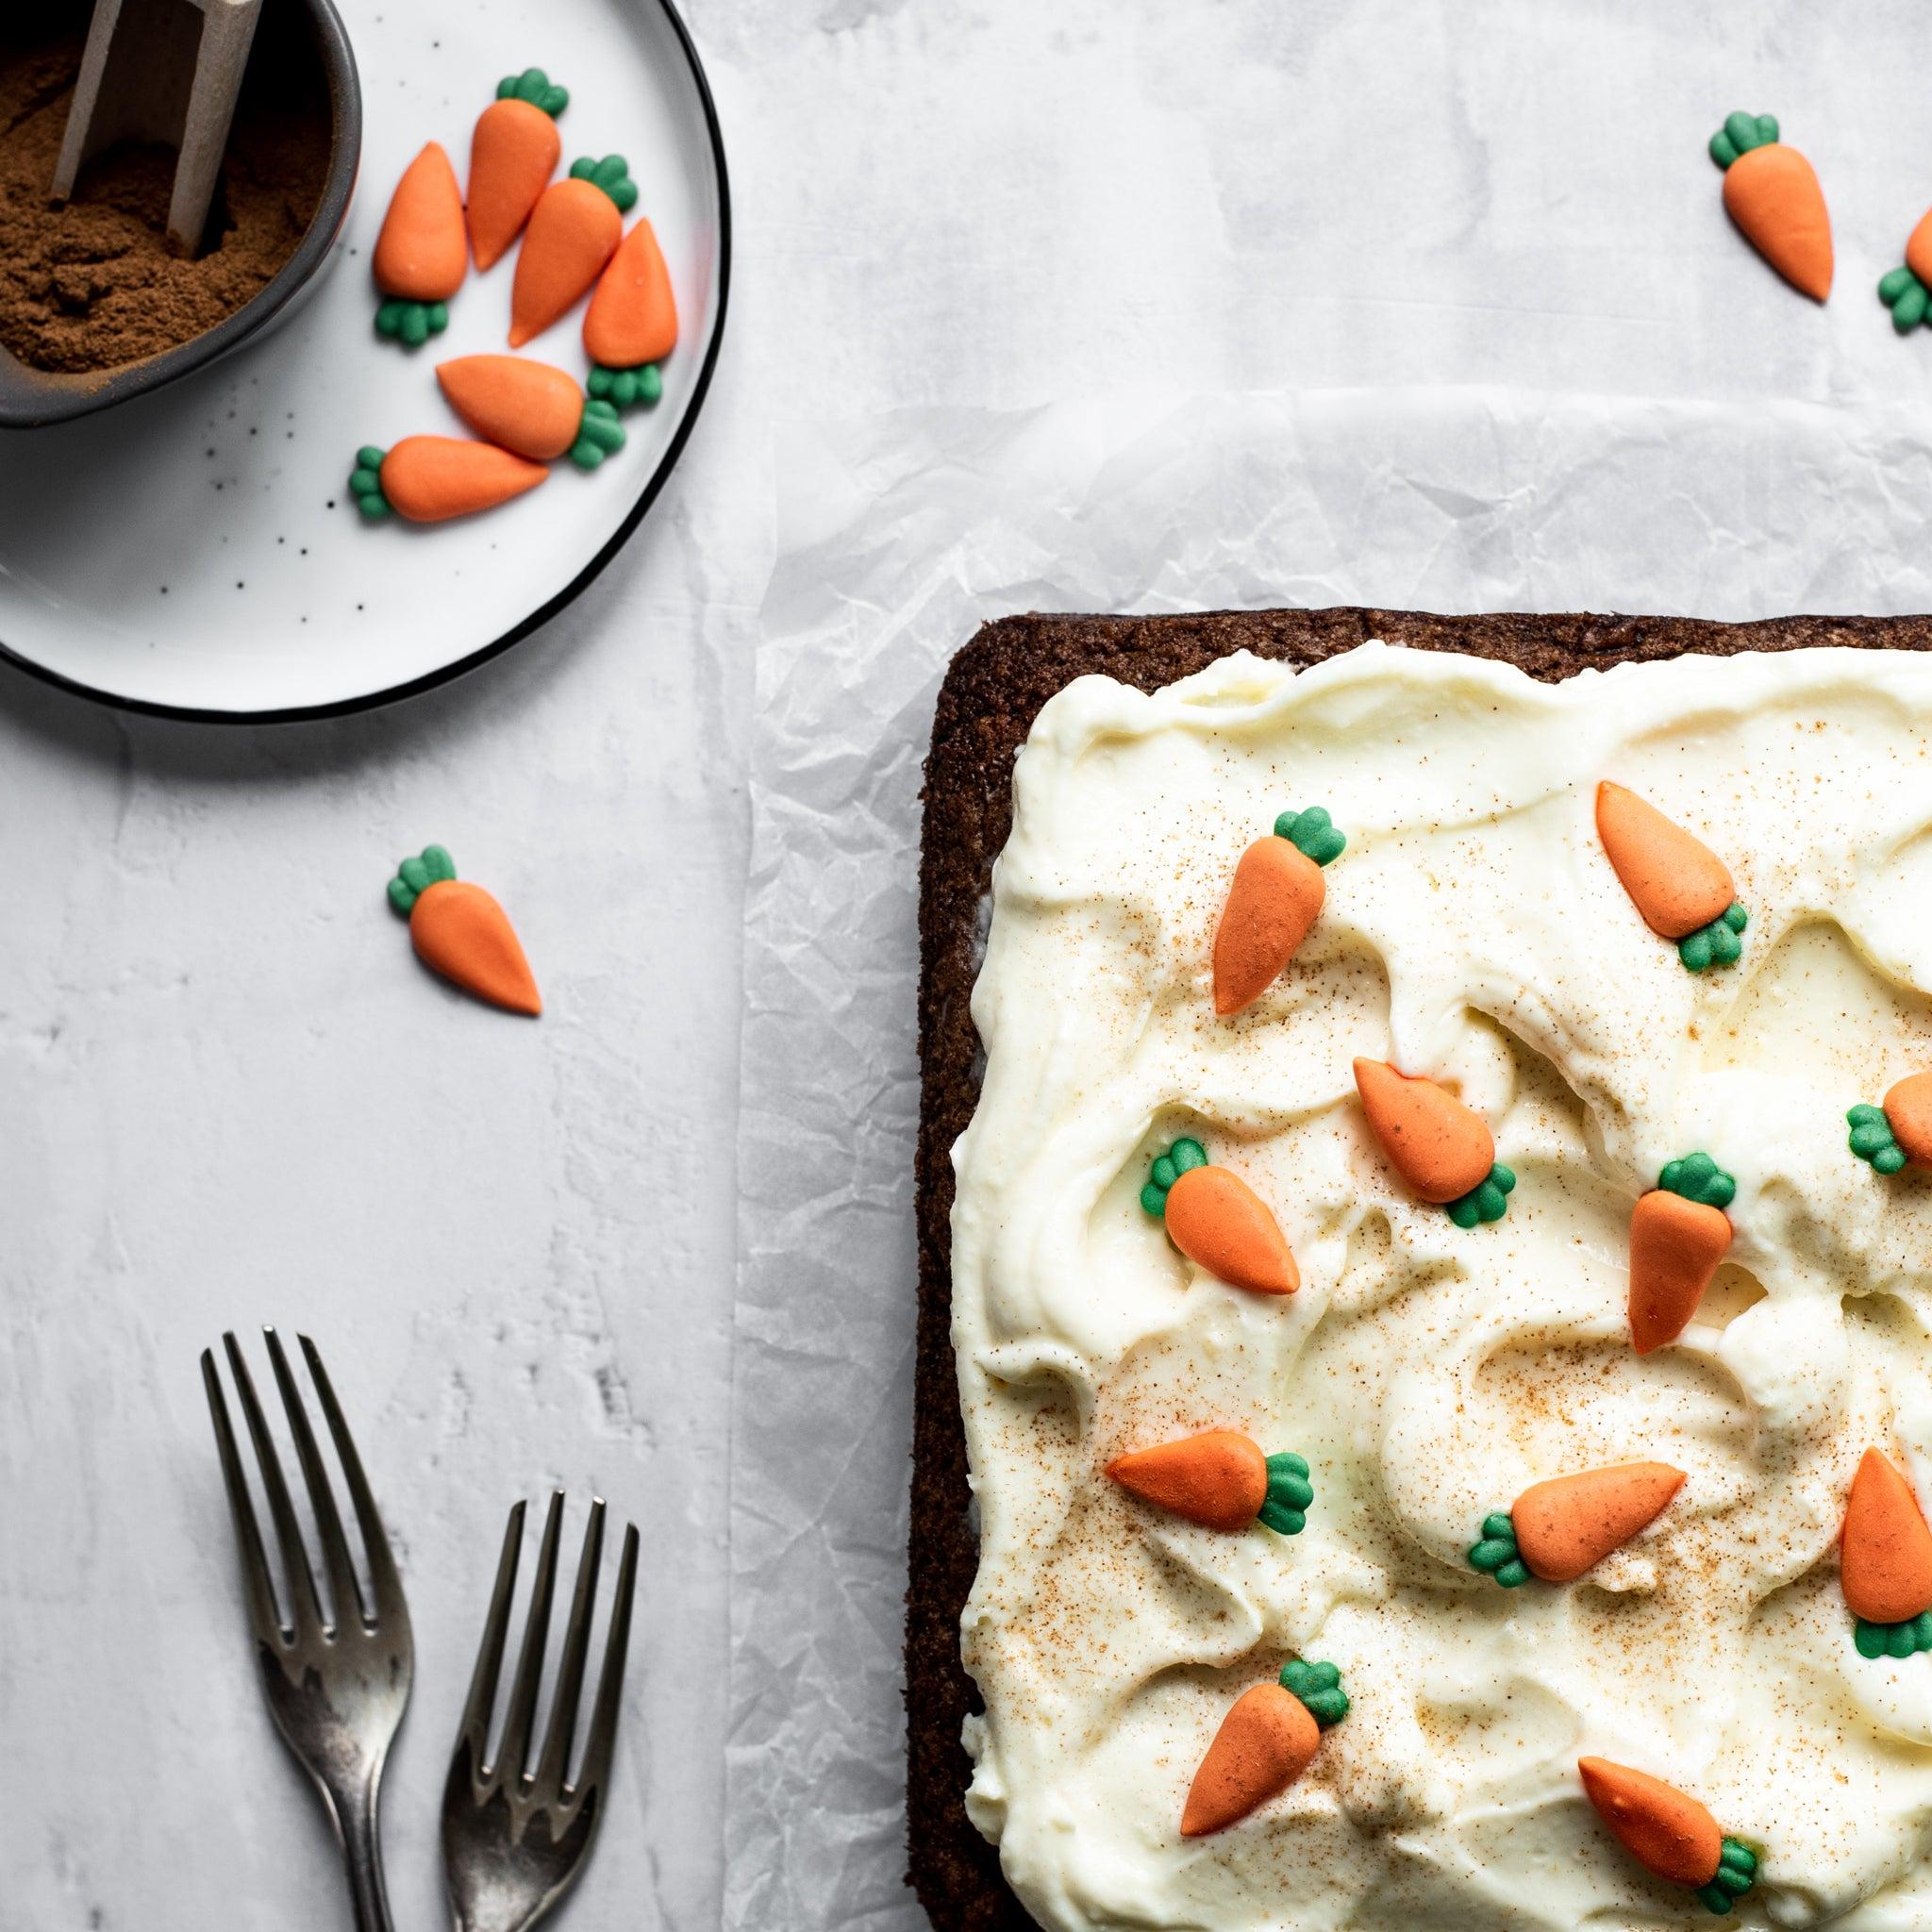 Carrot-Cake-Tray-Bake-SQUARE-2.jpg